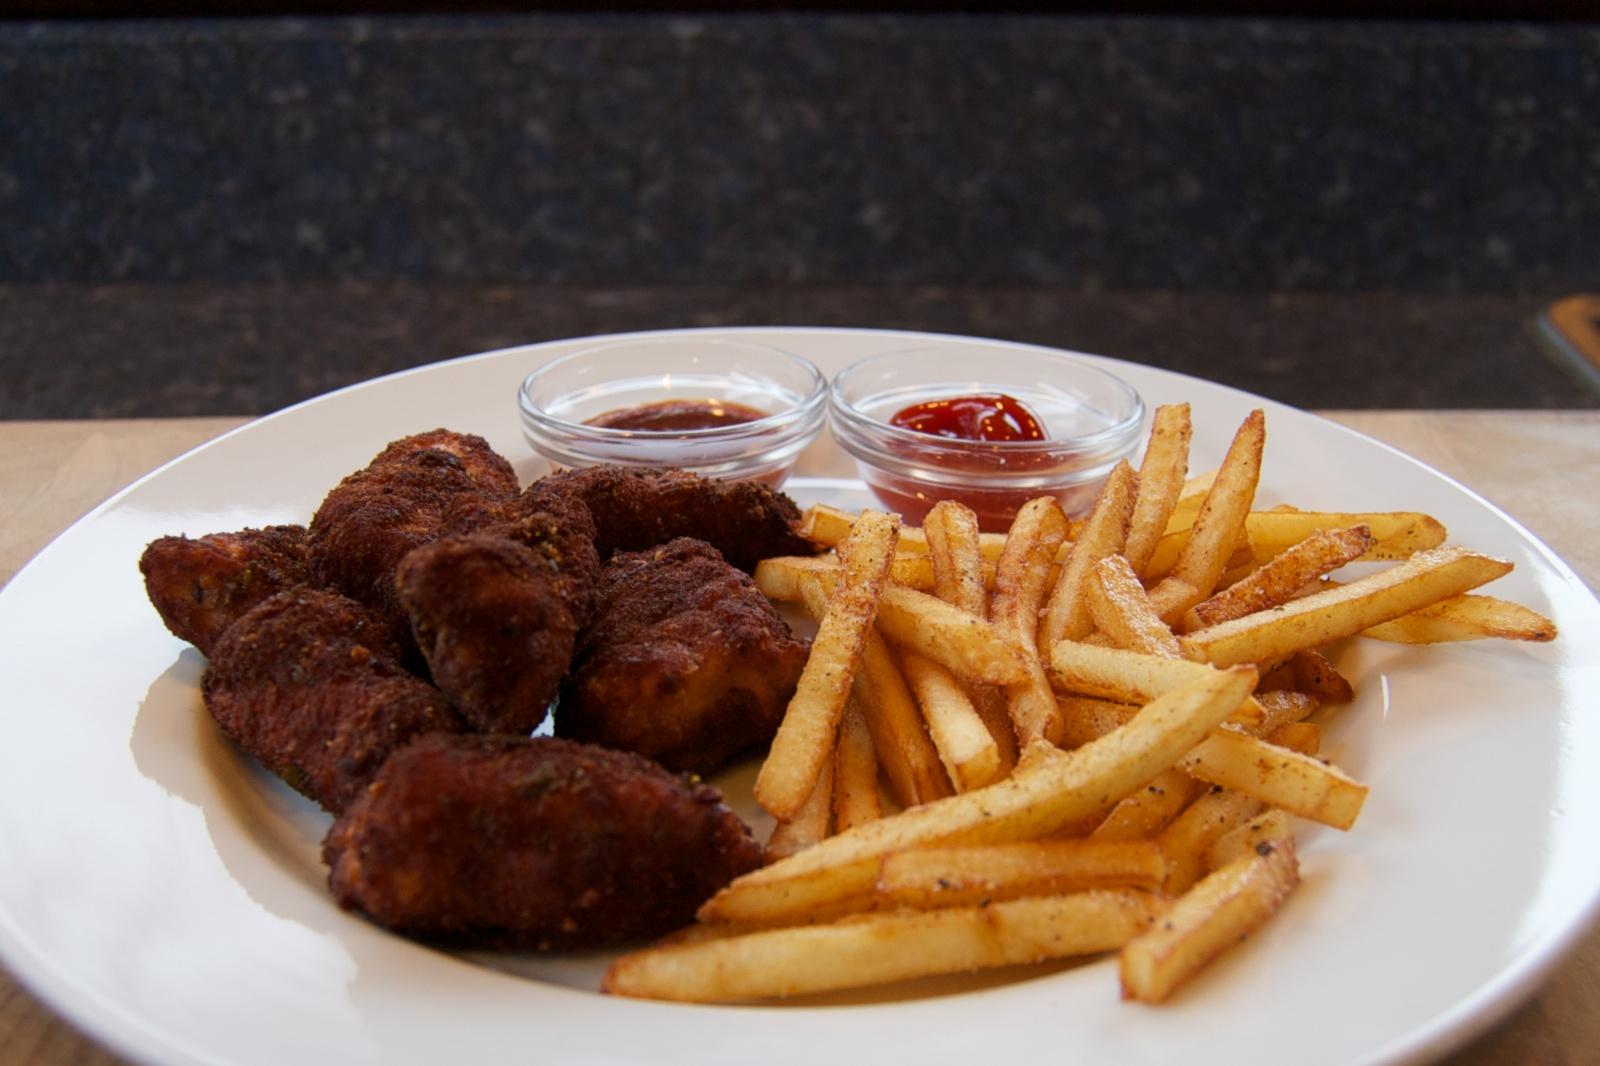 http://blog.rickk.com/food/2013/03/13/ate.2013.03.12.d.jpg